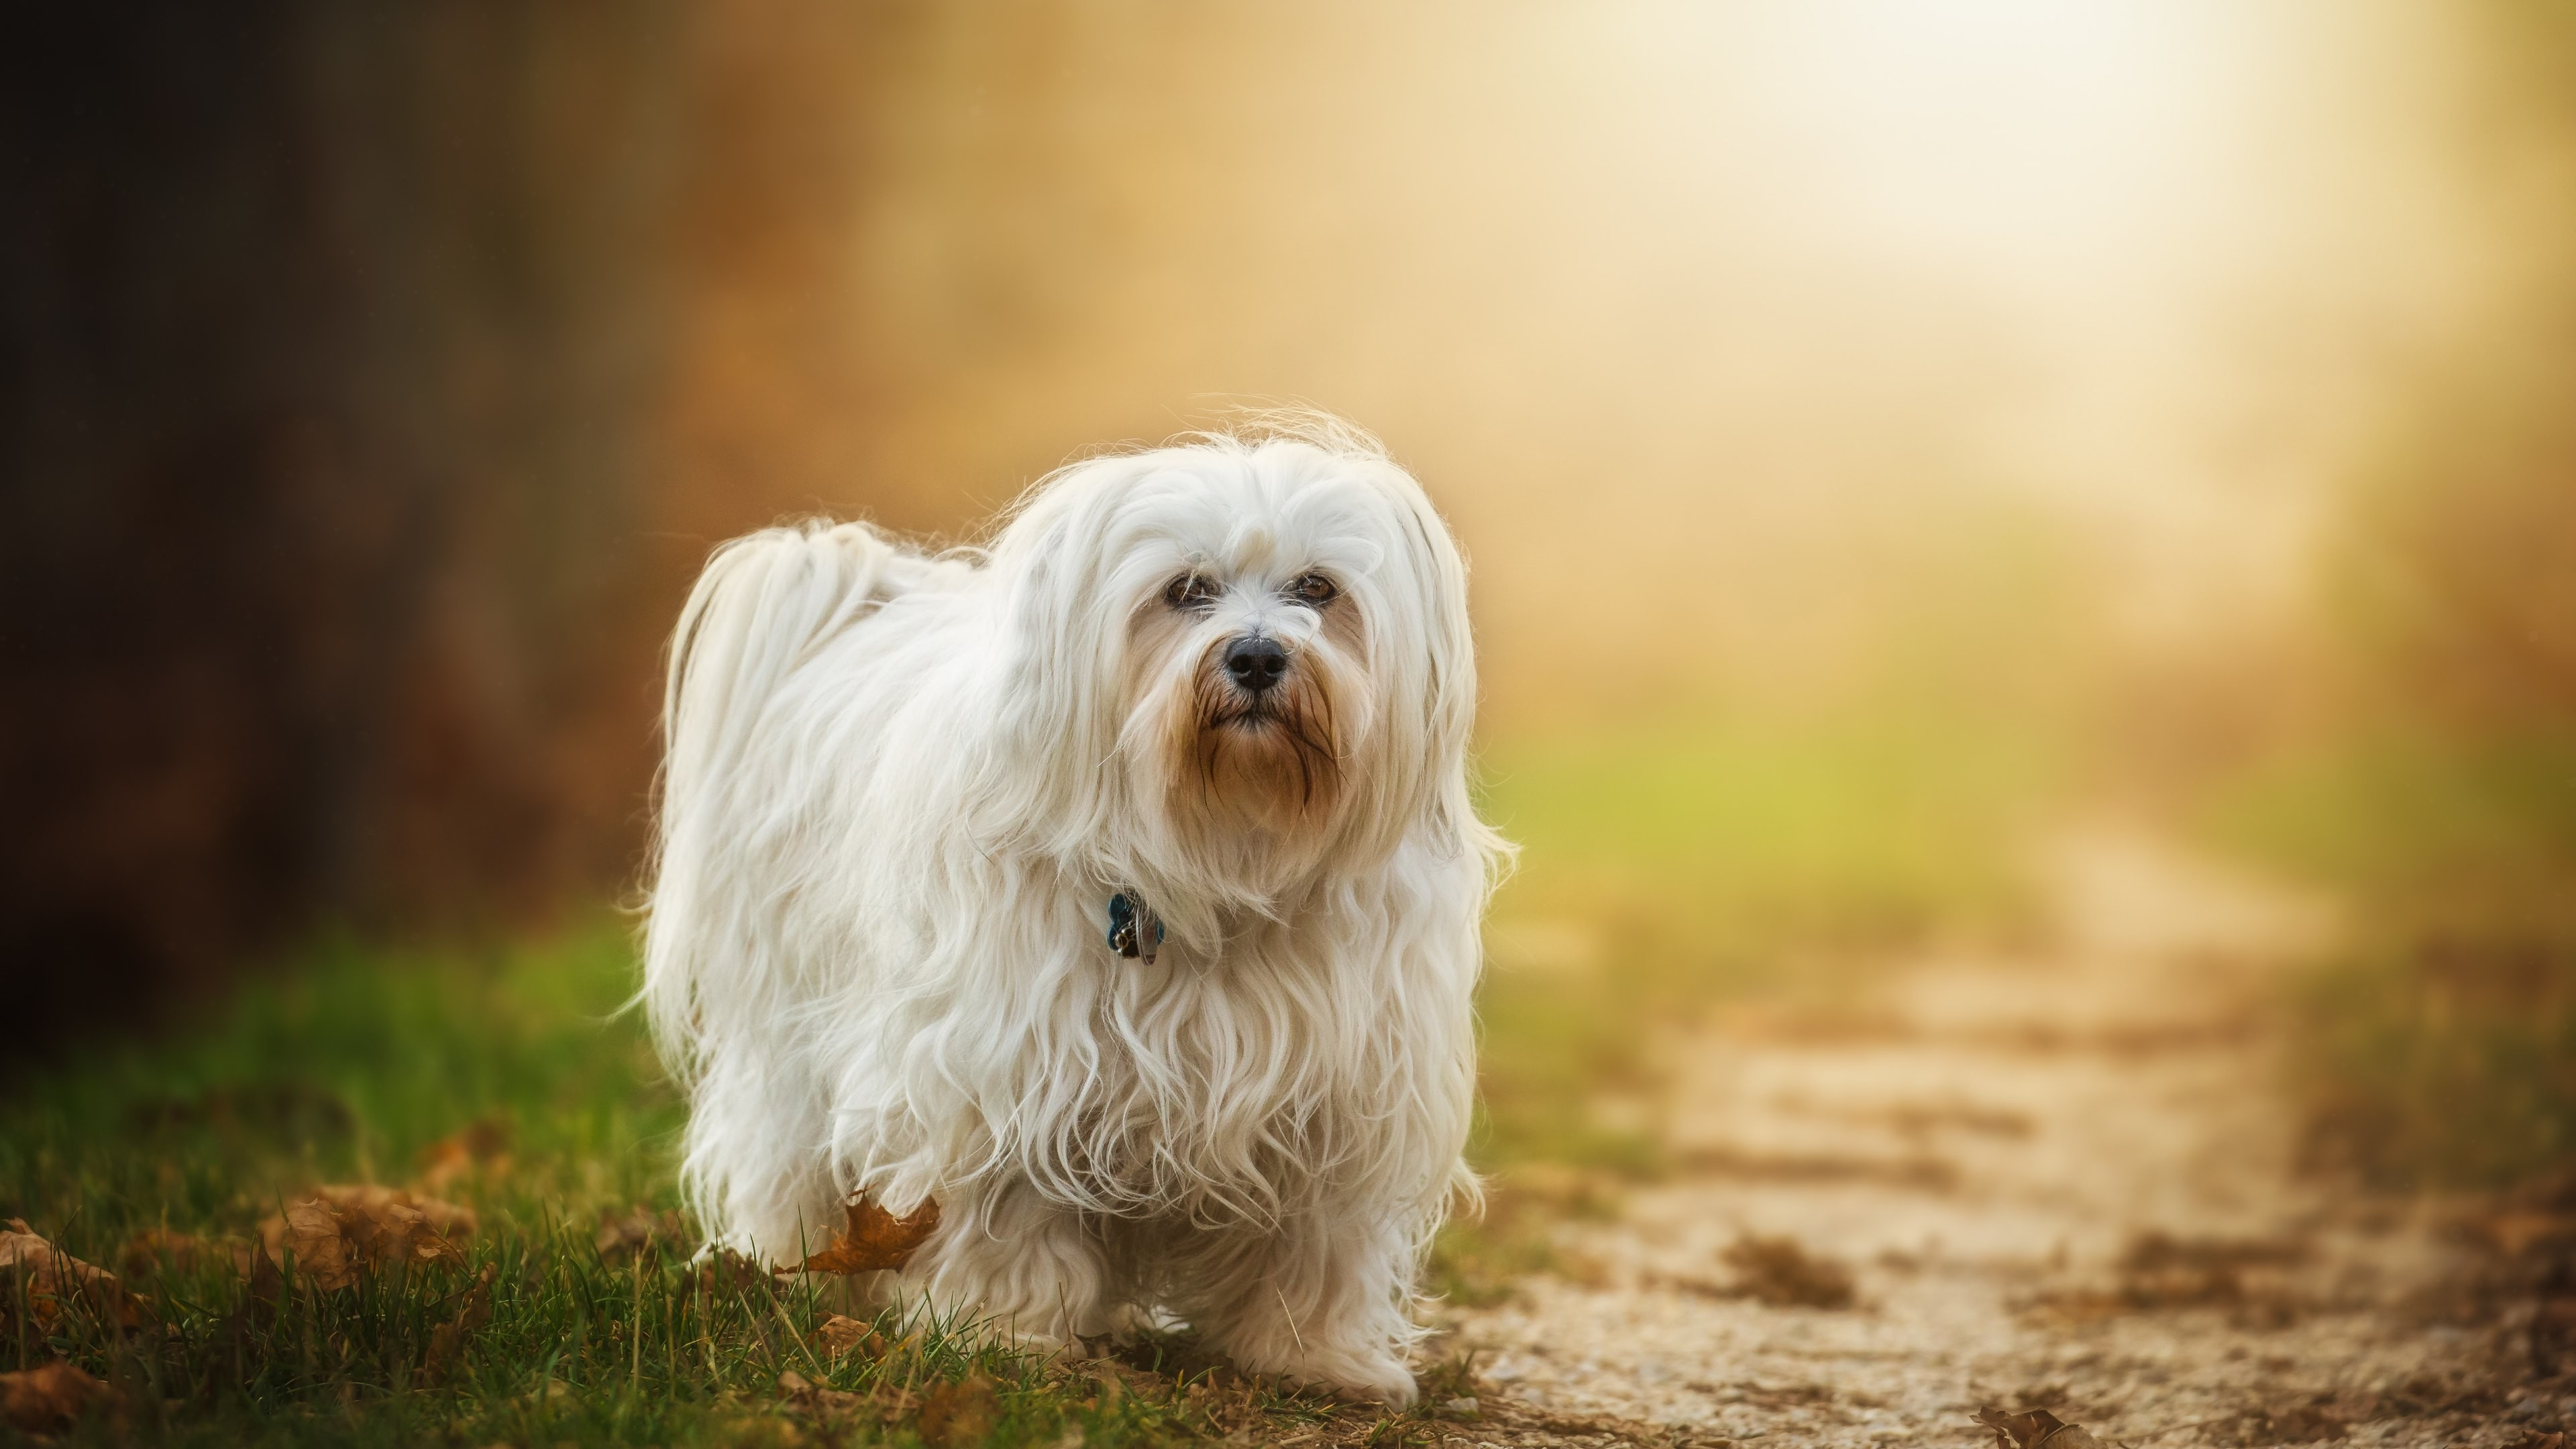 Explore Wallpaper Images Hd, Dog Wallpaper and more!